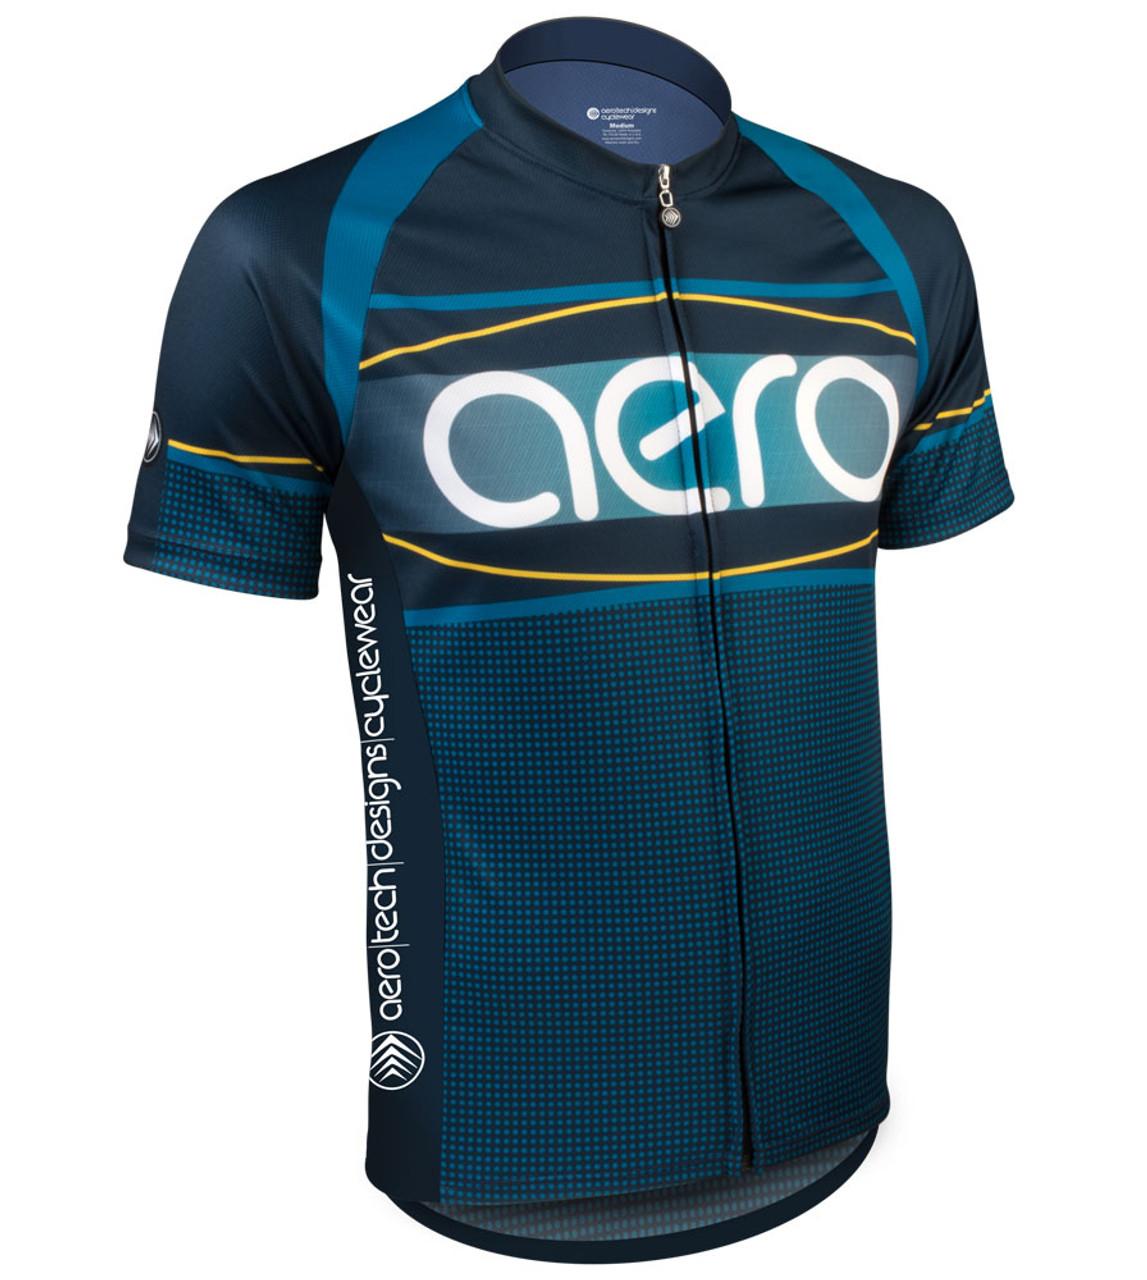 Aero Tech Designs Custom Cycling Jersey Peloton Fit c5c309d33